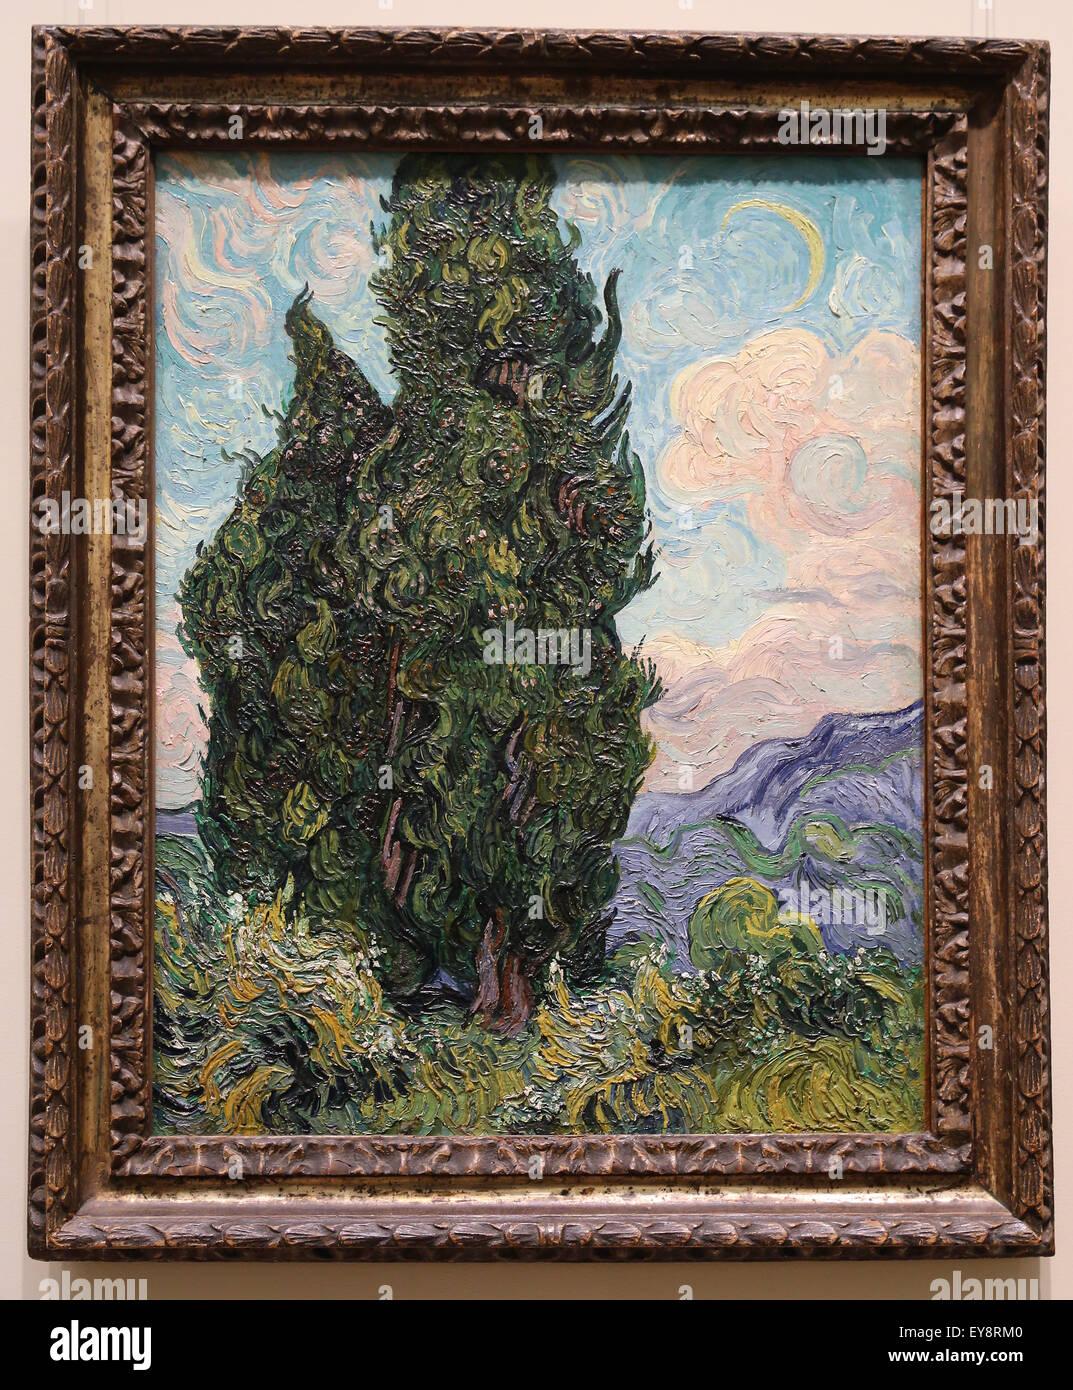 Vincent van Gogh (1853-1890).  Dutch painter. Cypresses, 1889. Oil on canvas. Metropolitan Museum of Art. NY. USA. - Stock Image